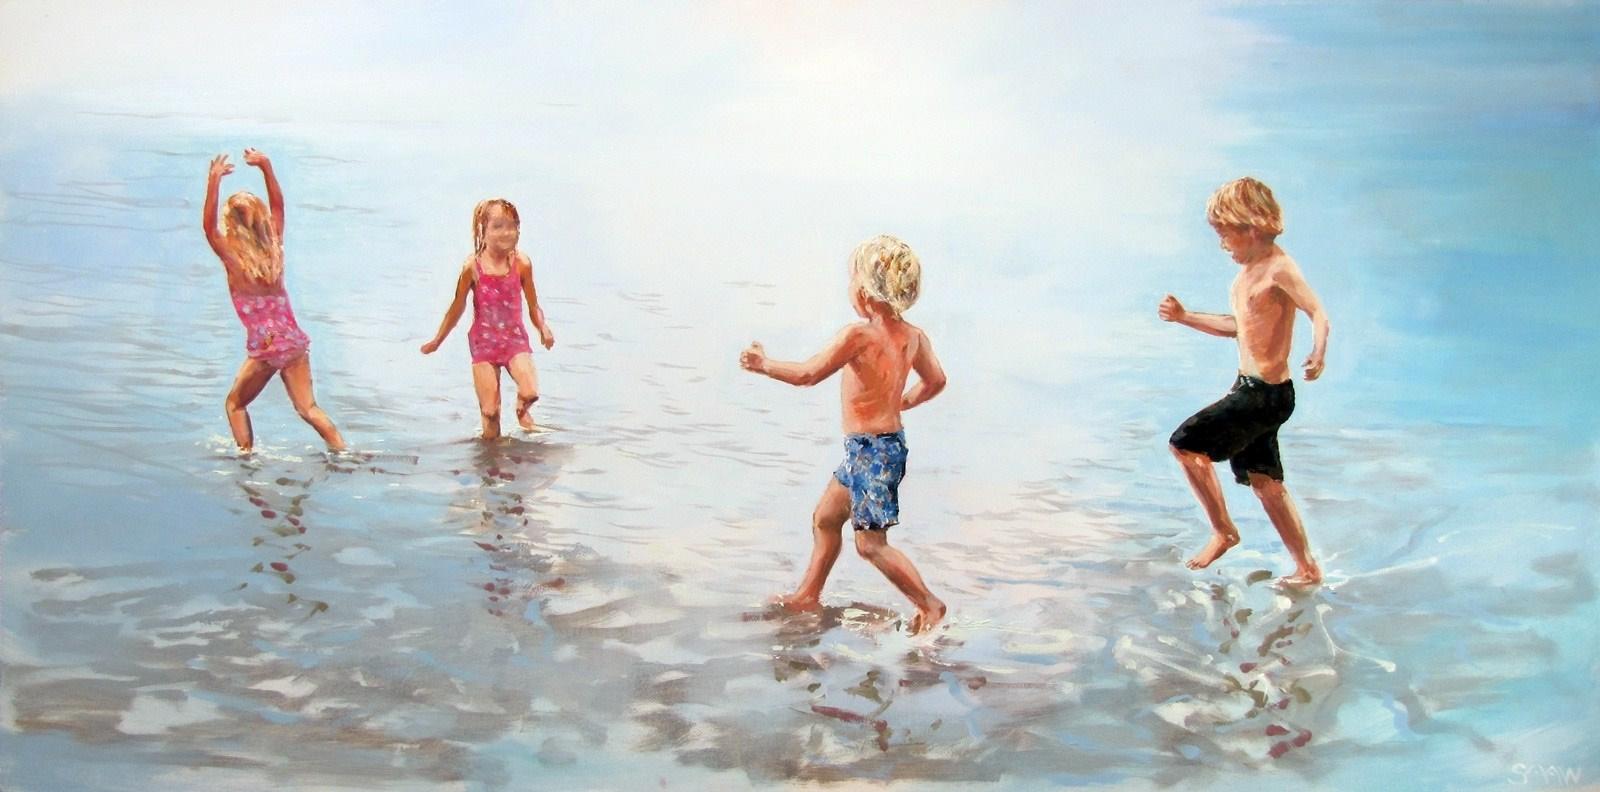 Summer Joy - Robert Shaw